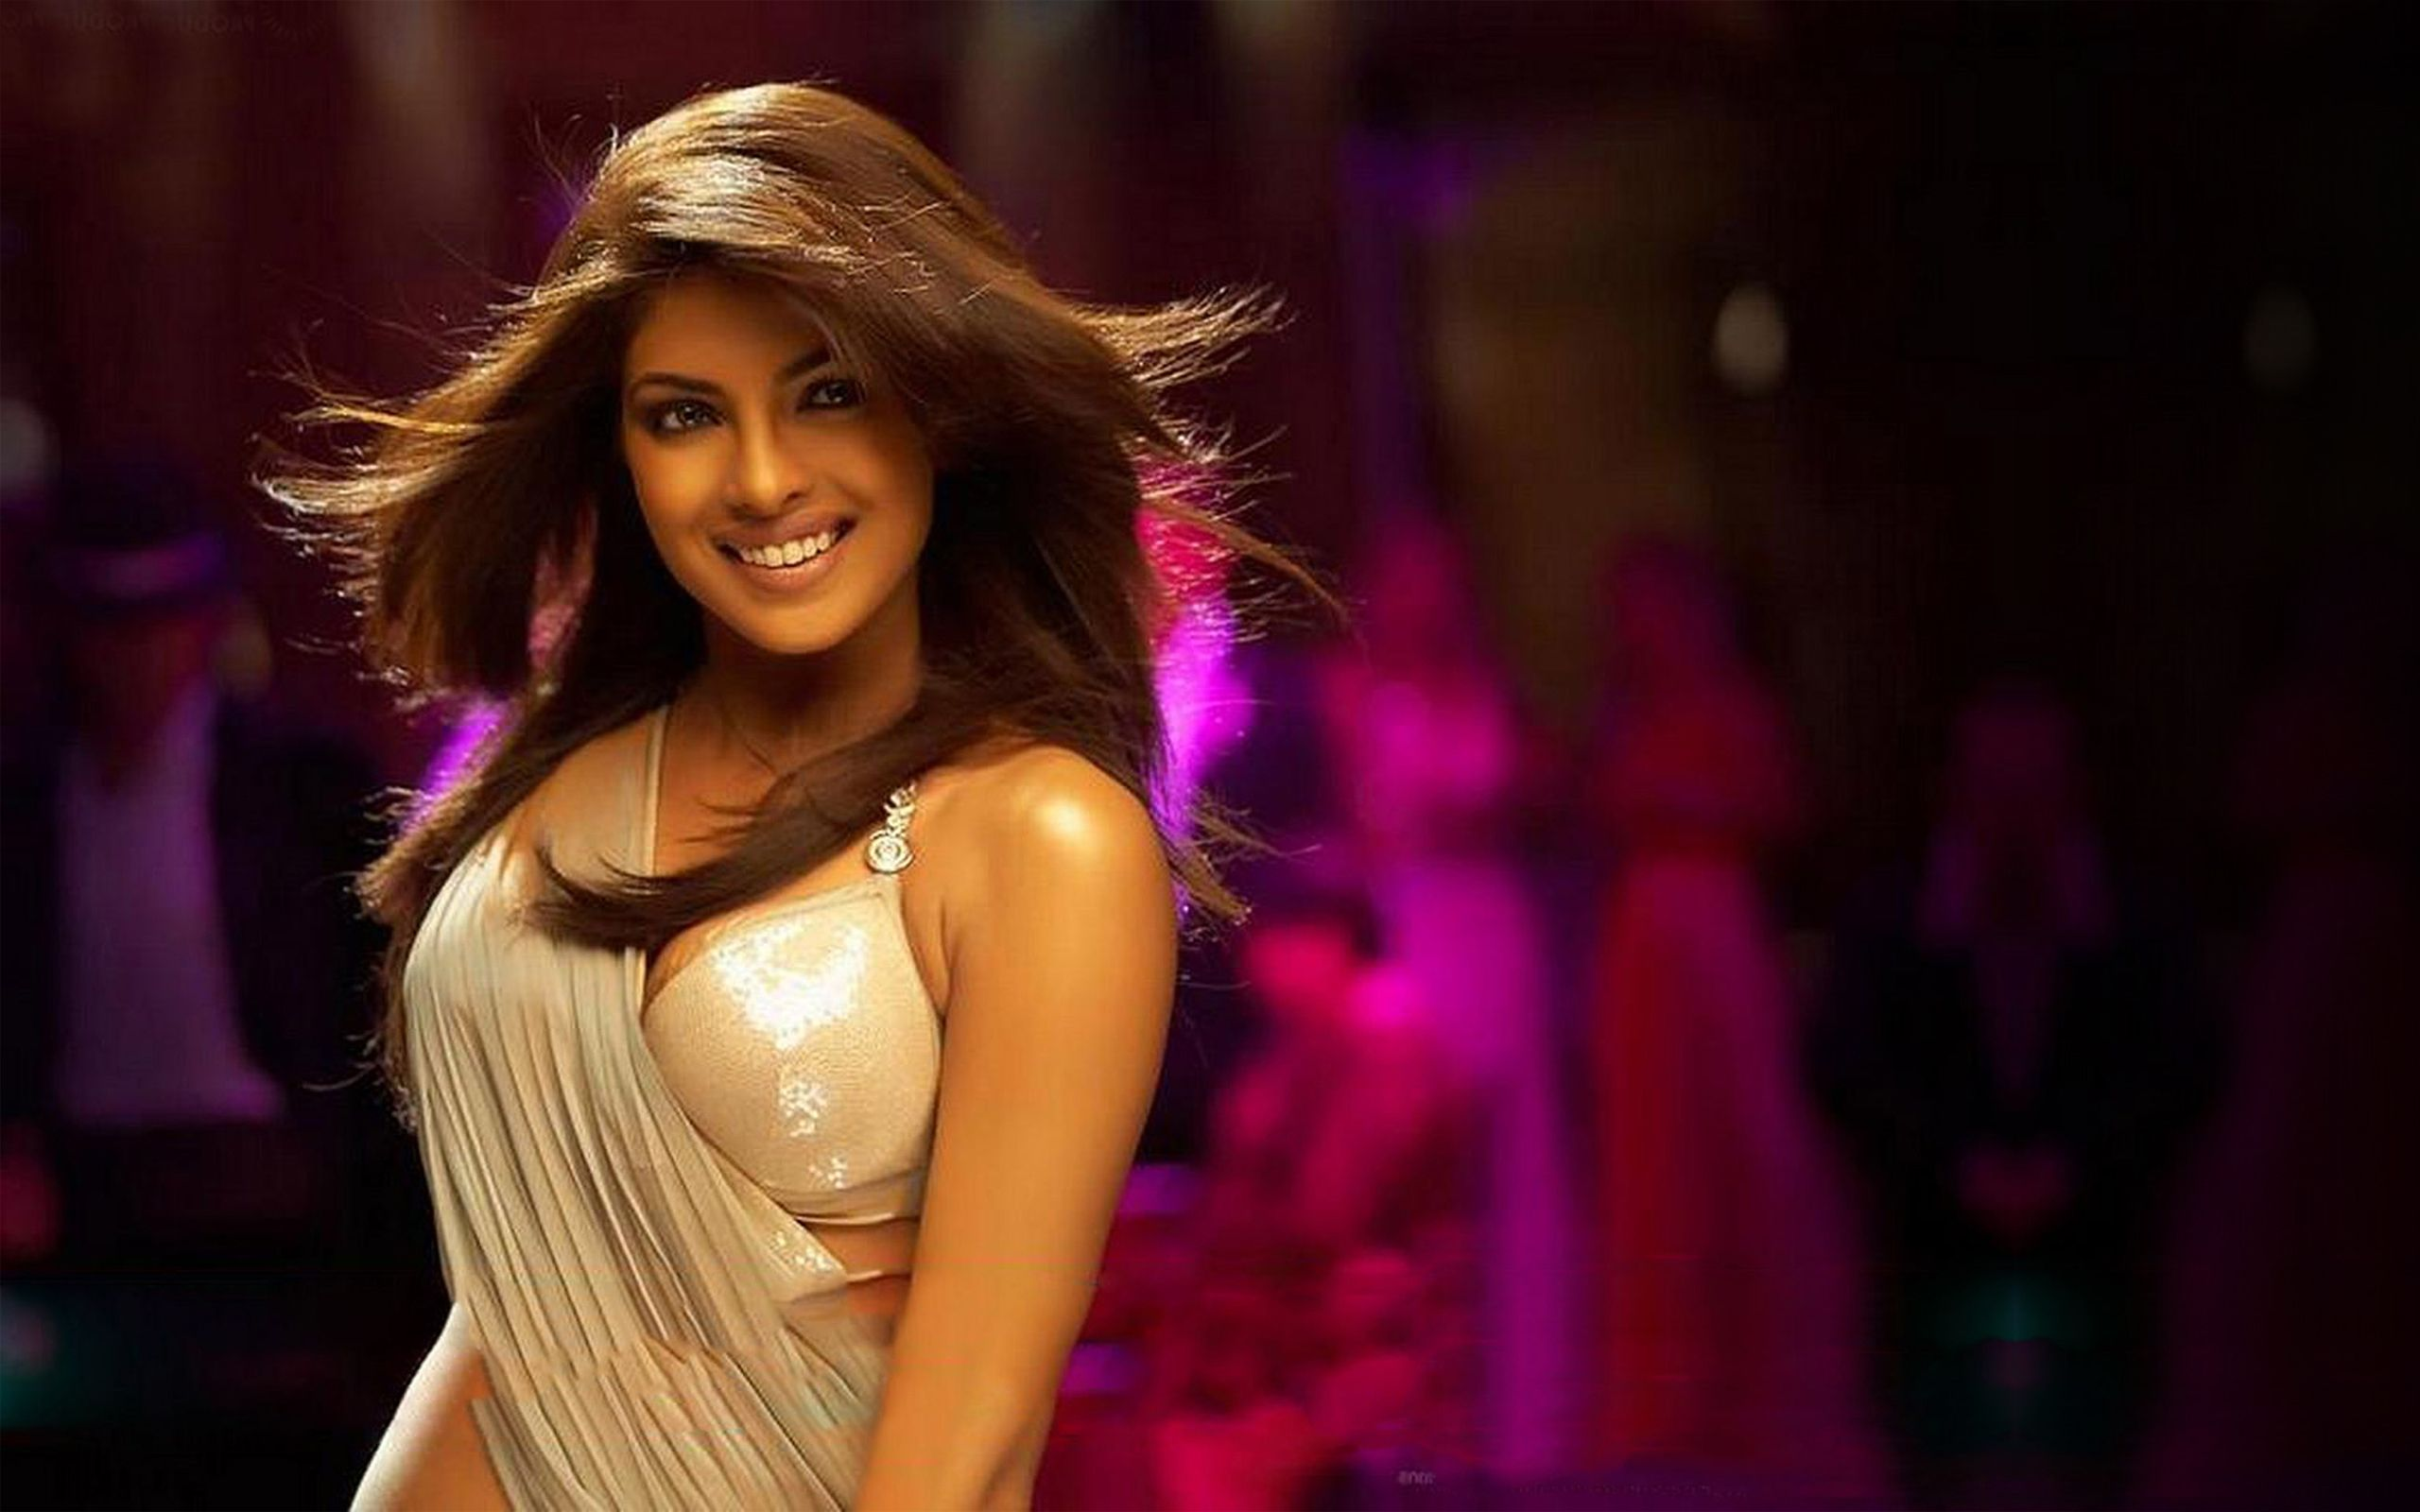 Priyanka chopra sexy image hd